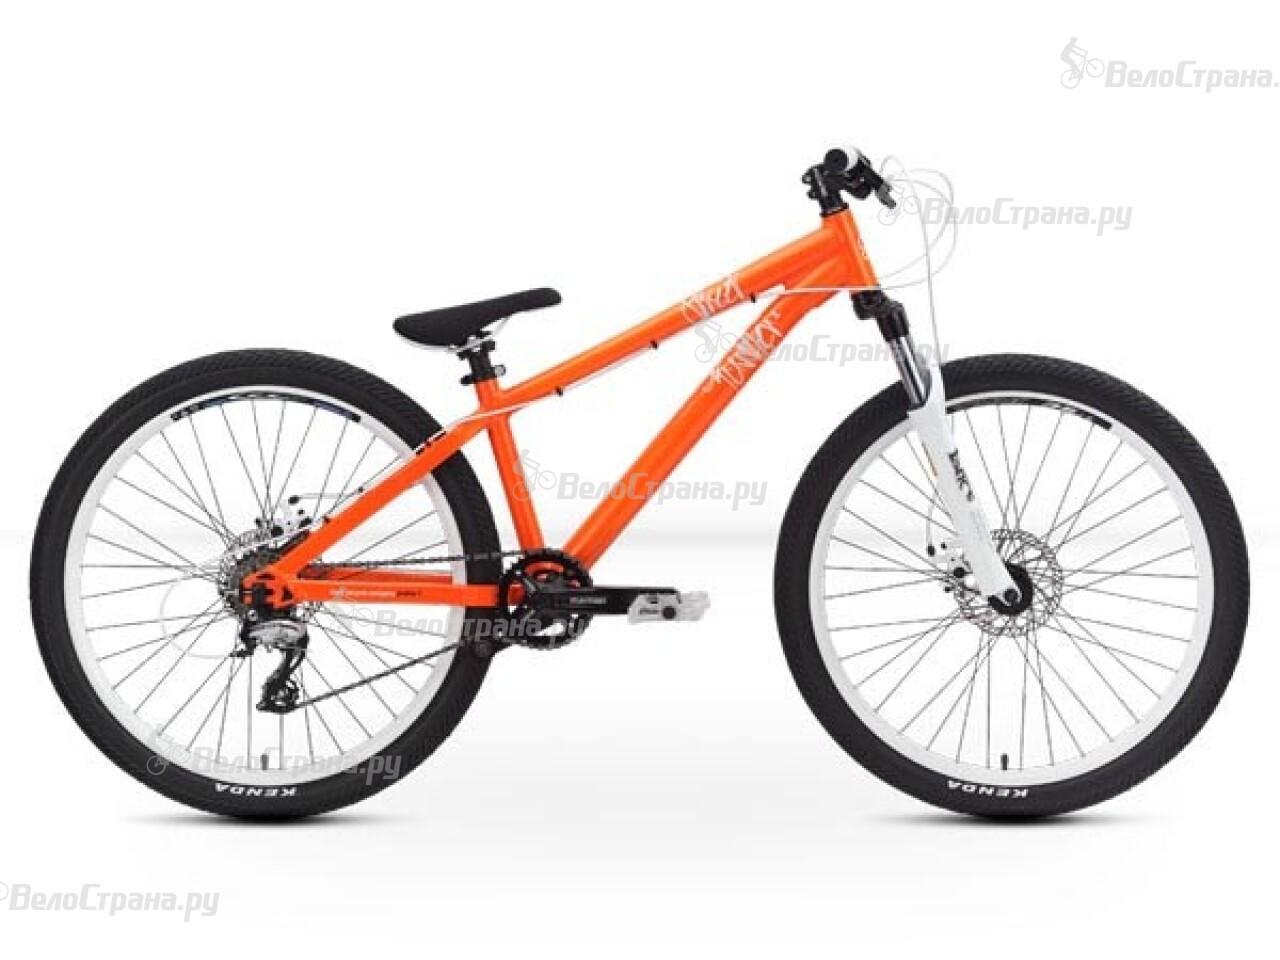 Велосипед Stark Pusher 1 (2013) велосипед stark outpost 26 1 d 2018